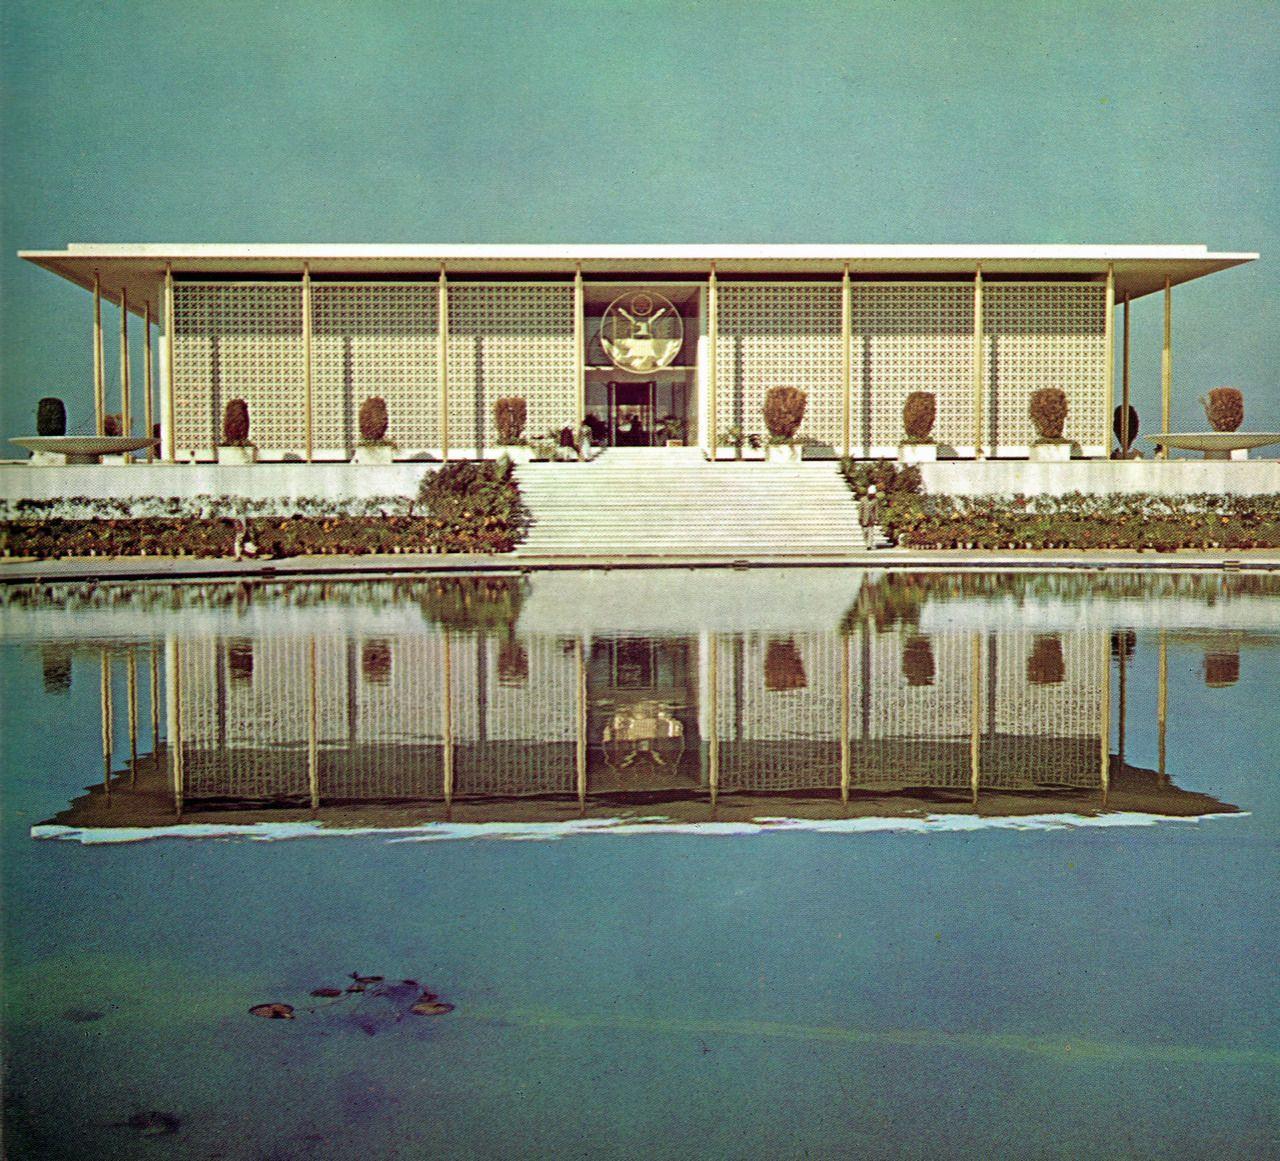 N85 Residence In New Delhi India: U.S. Embassy, New Delhi India (1959)